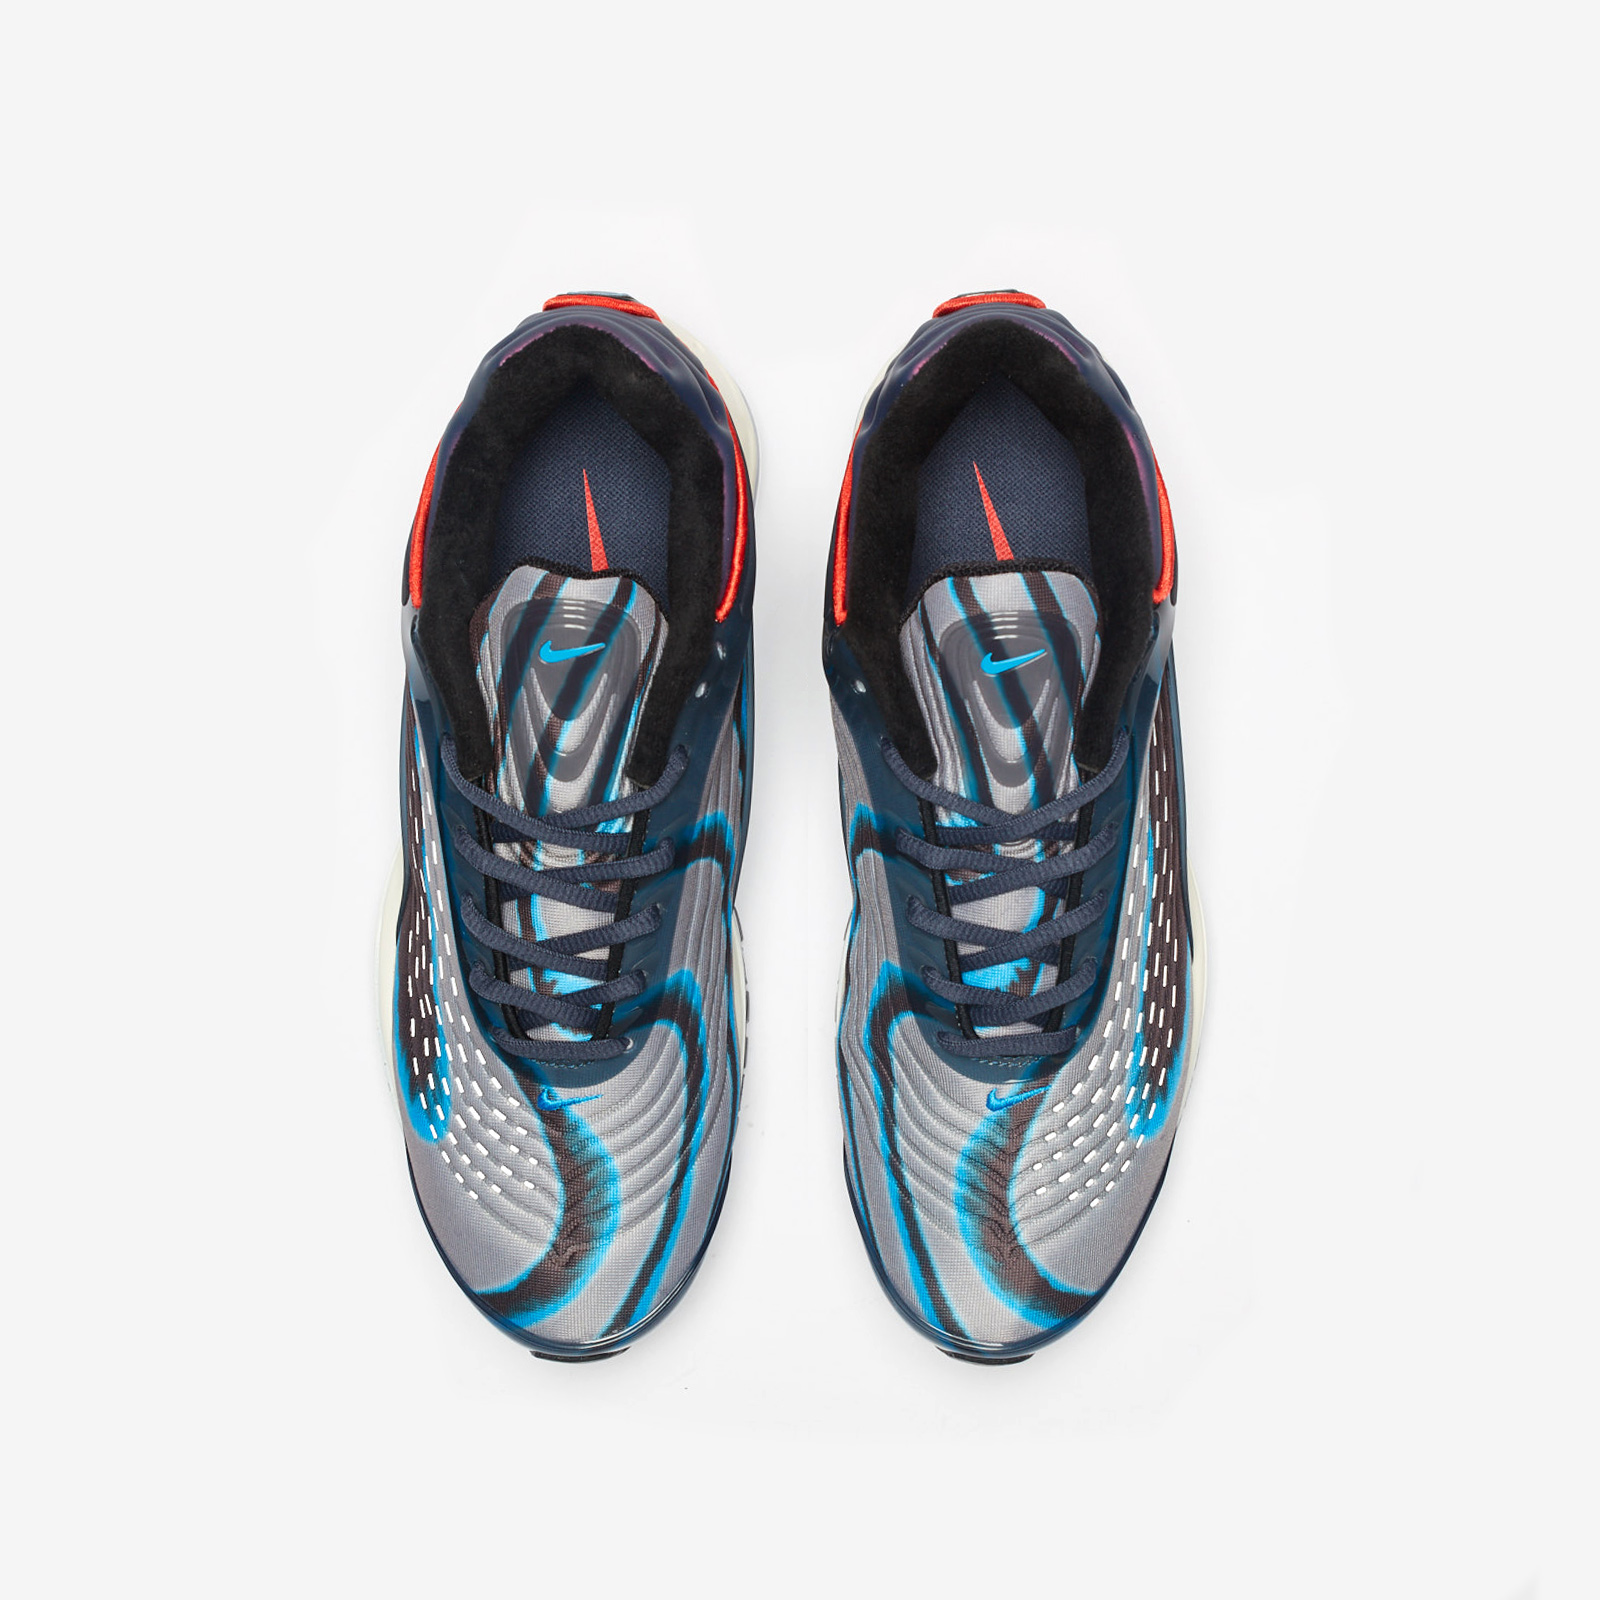 Nike Air Max Deluxe Aj7831 402 Sneakersnstuff | 1999年